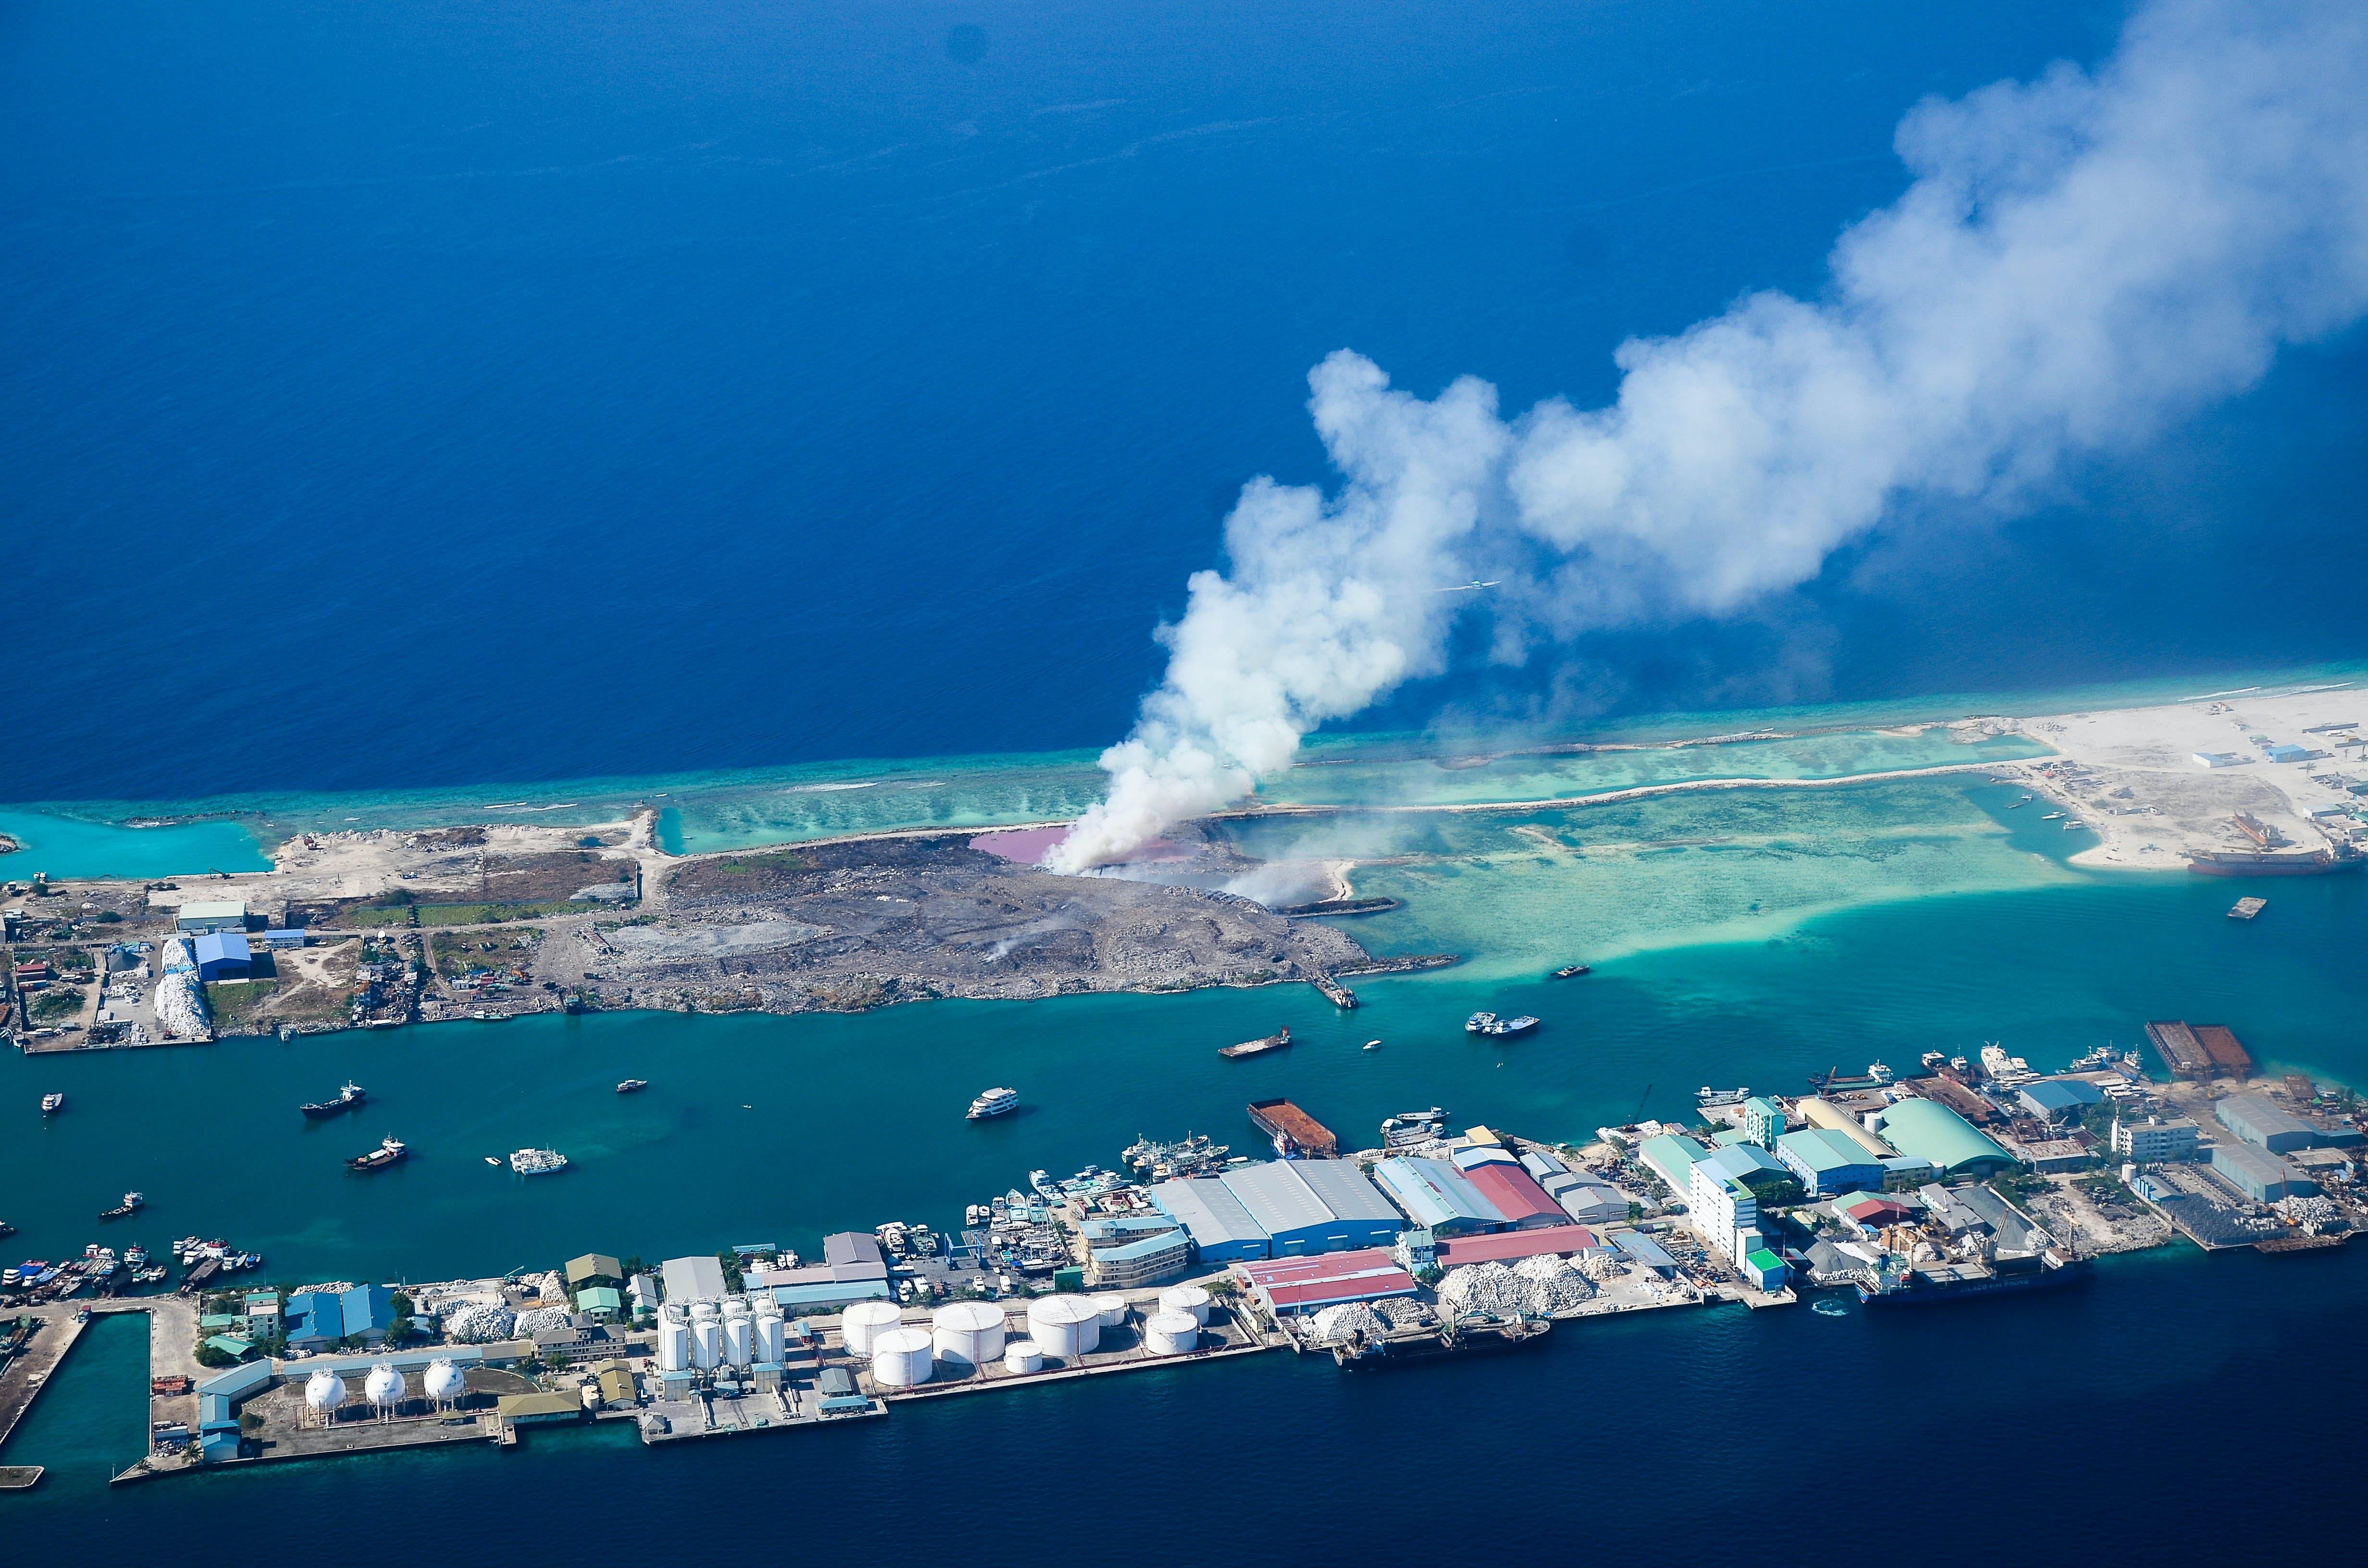 Aerial View of Land Blowing Smoke